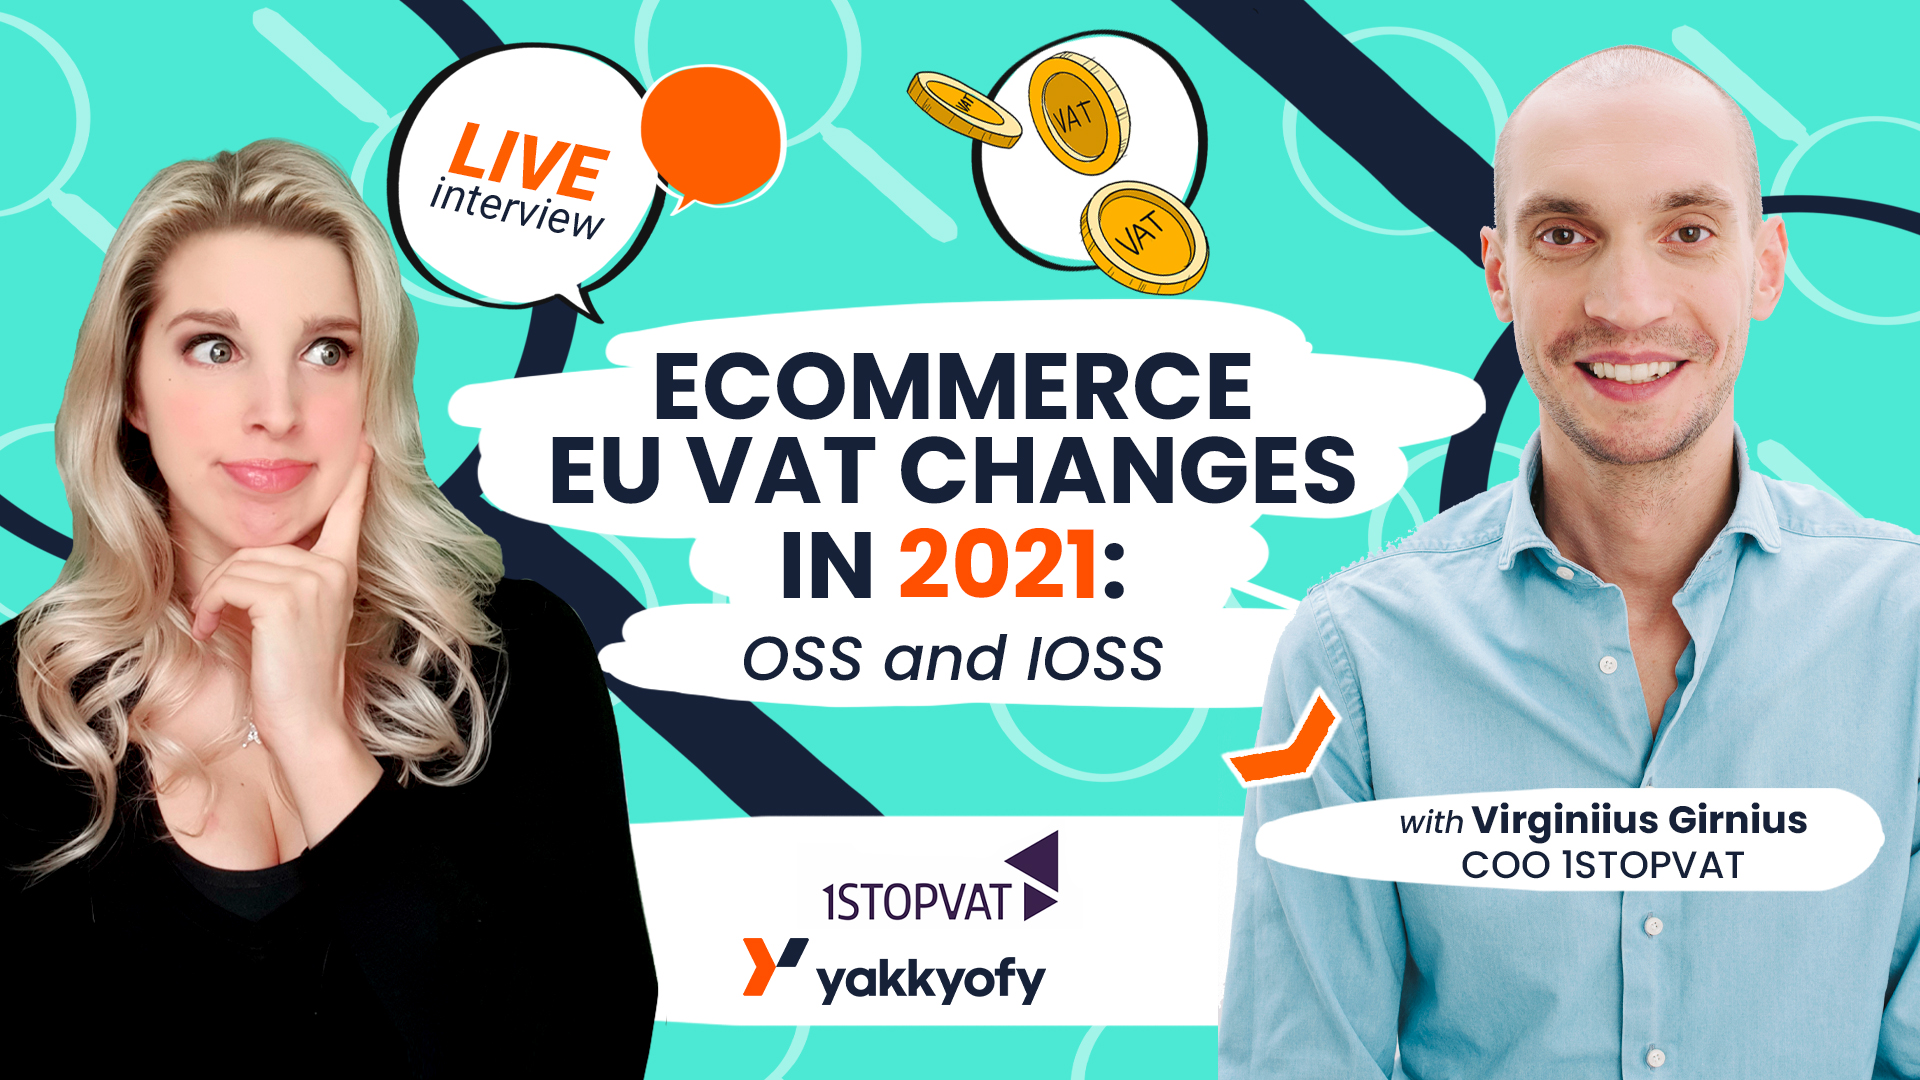 eCommerce EU VAT changes